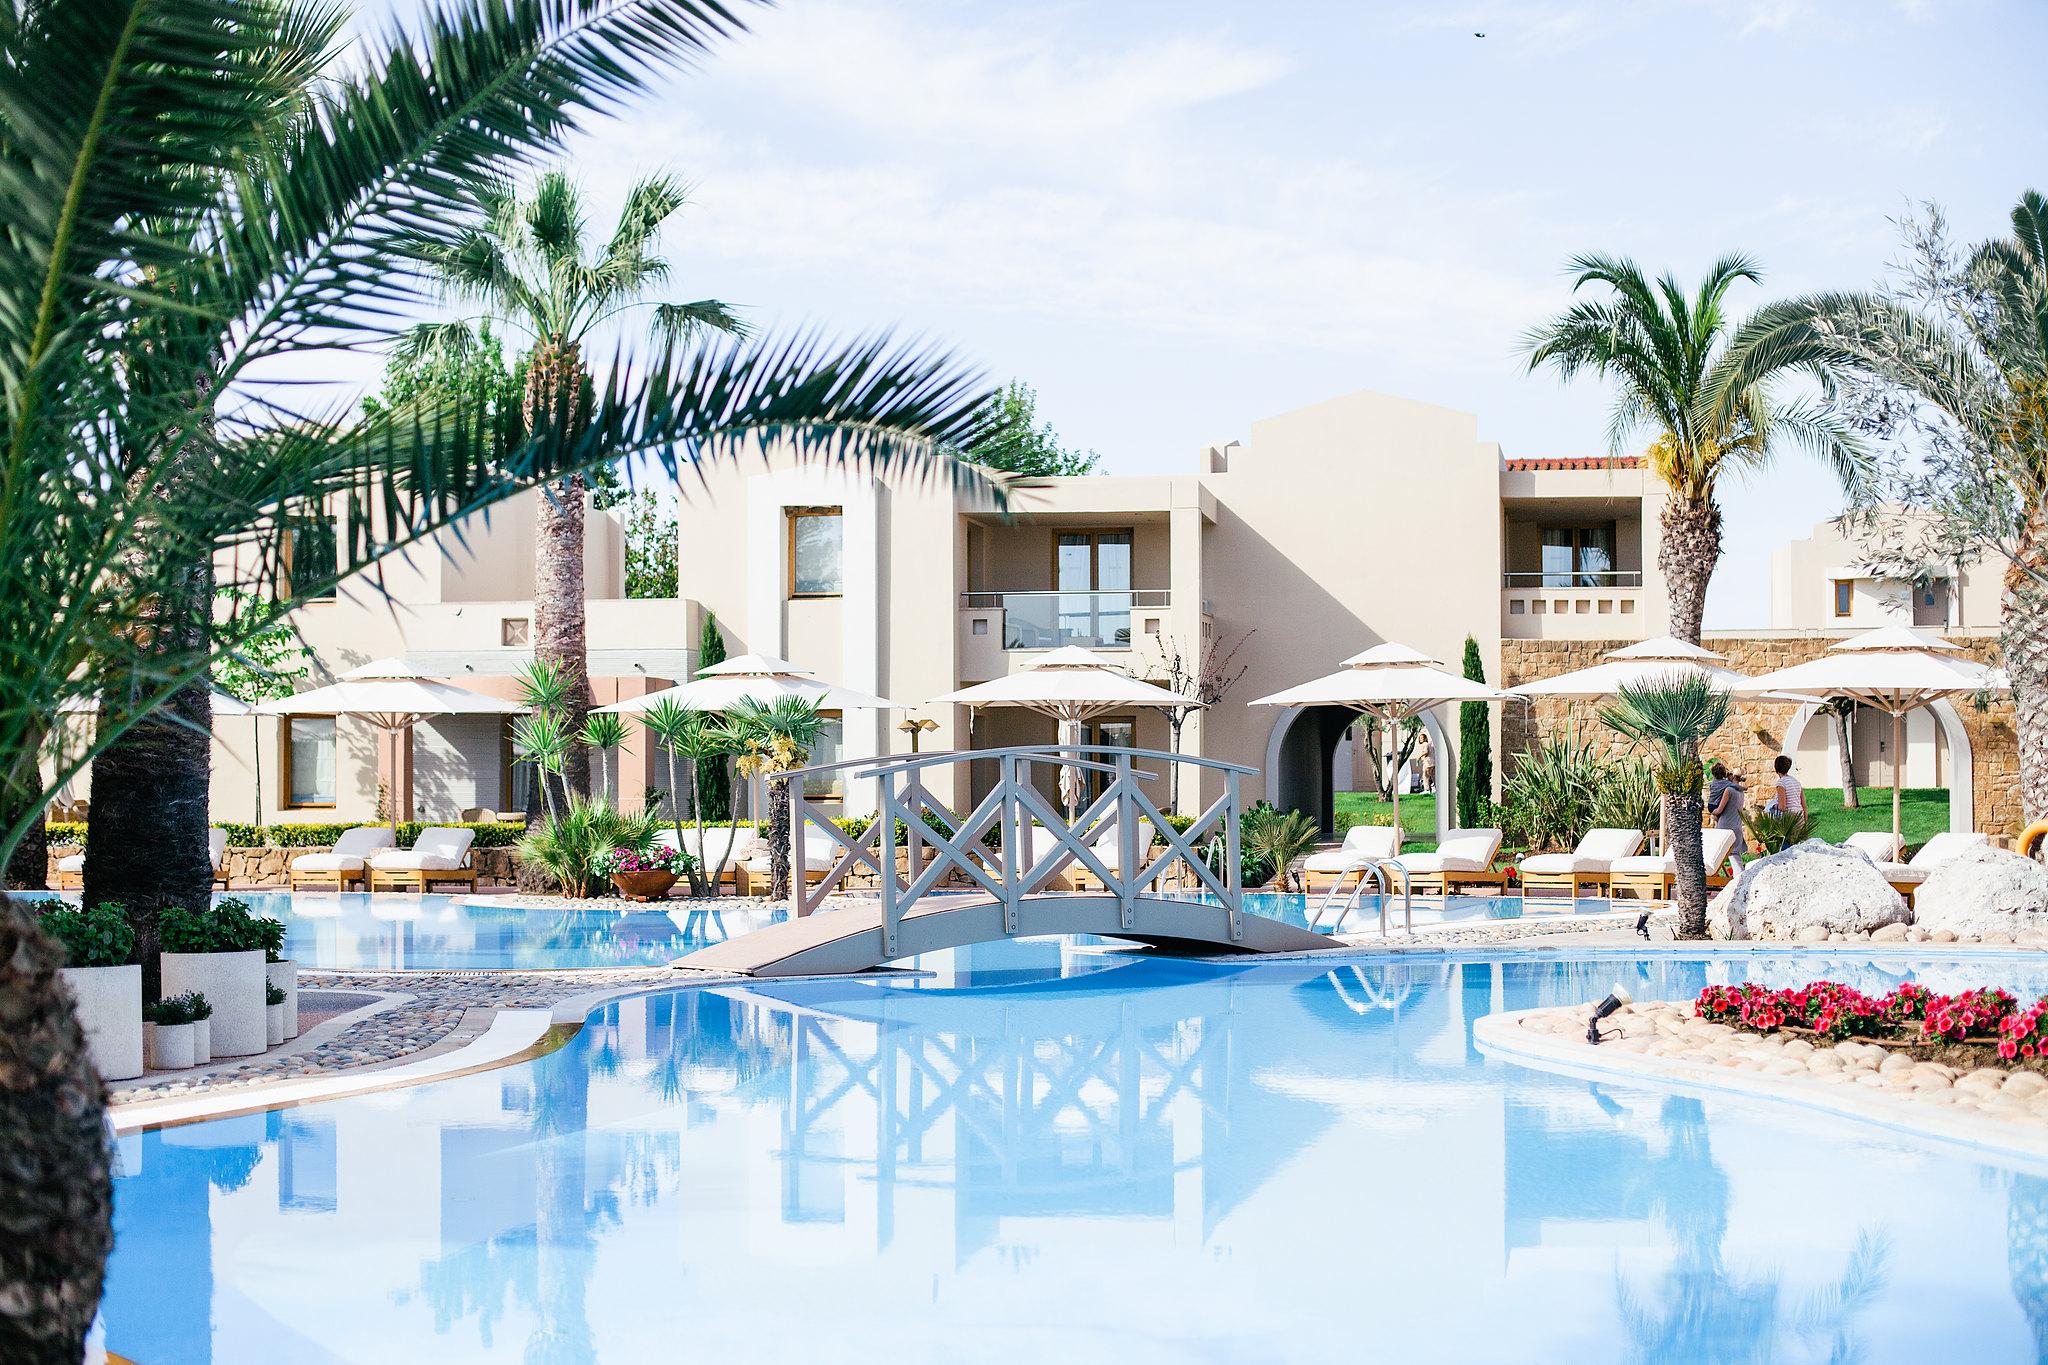 Greece, Thessaloniki, Sani Resort